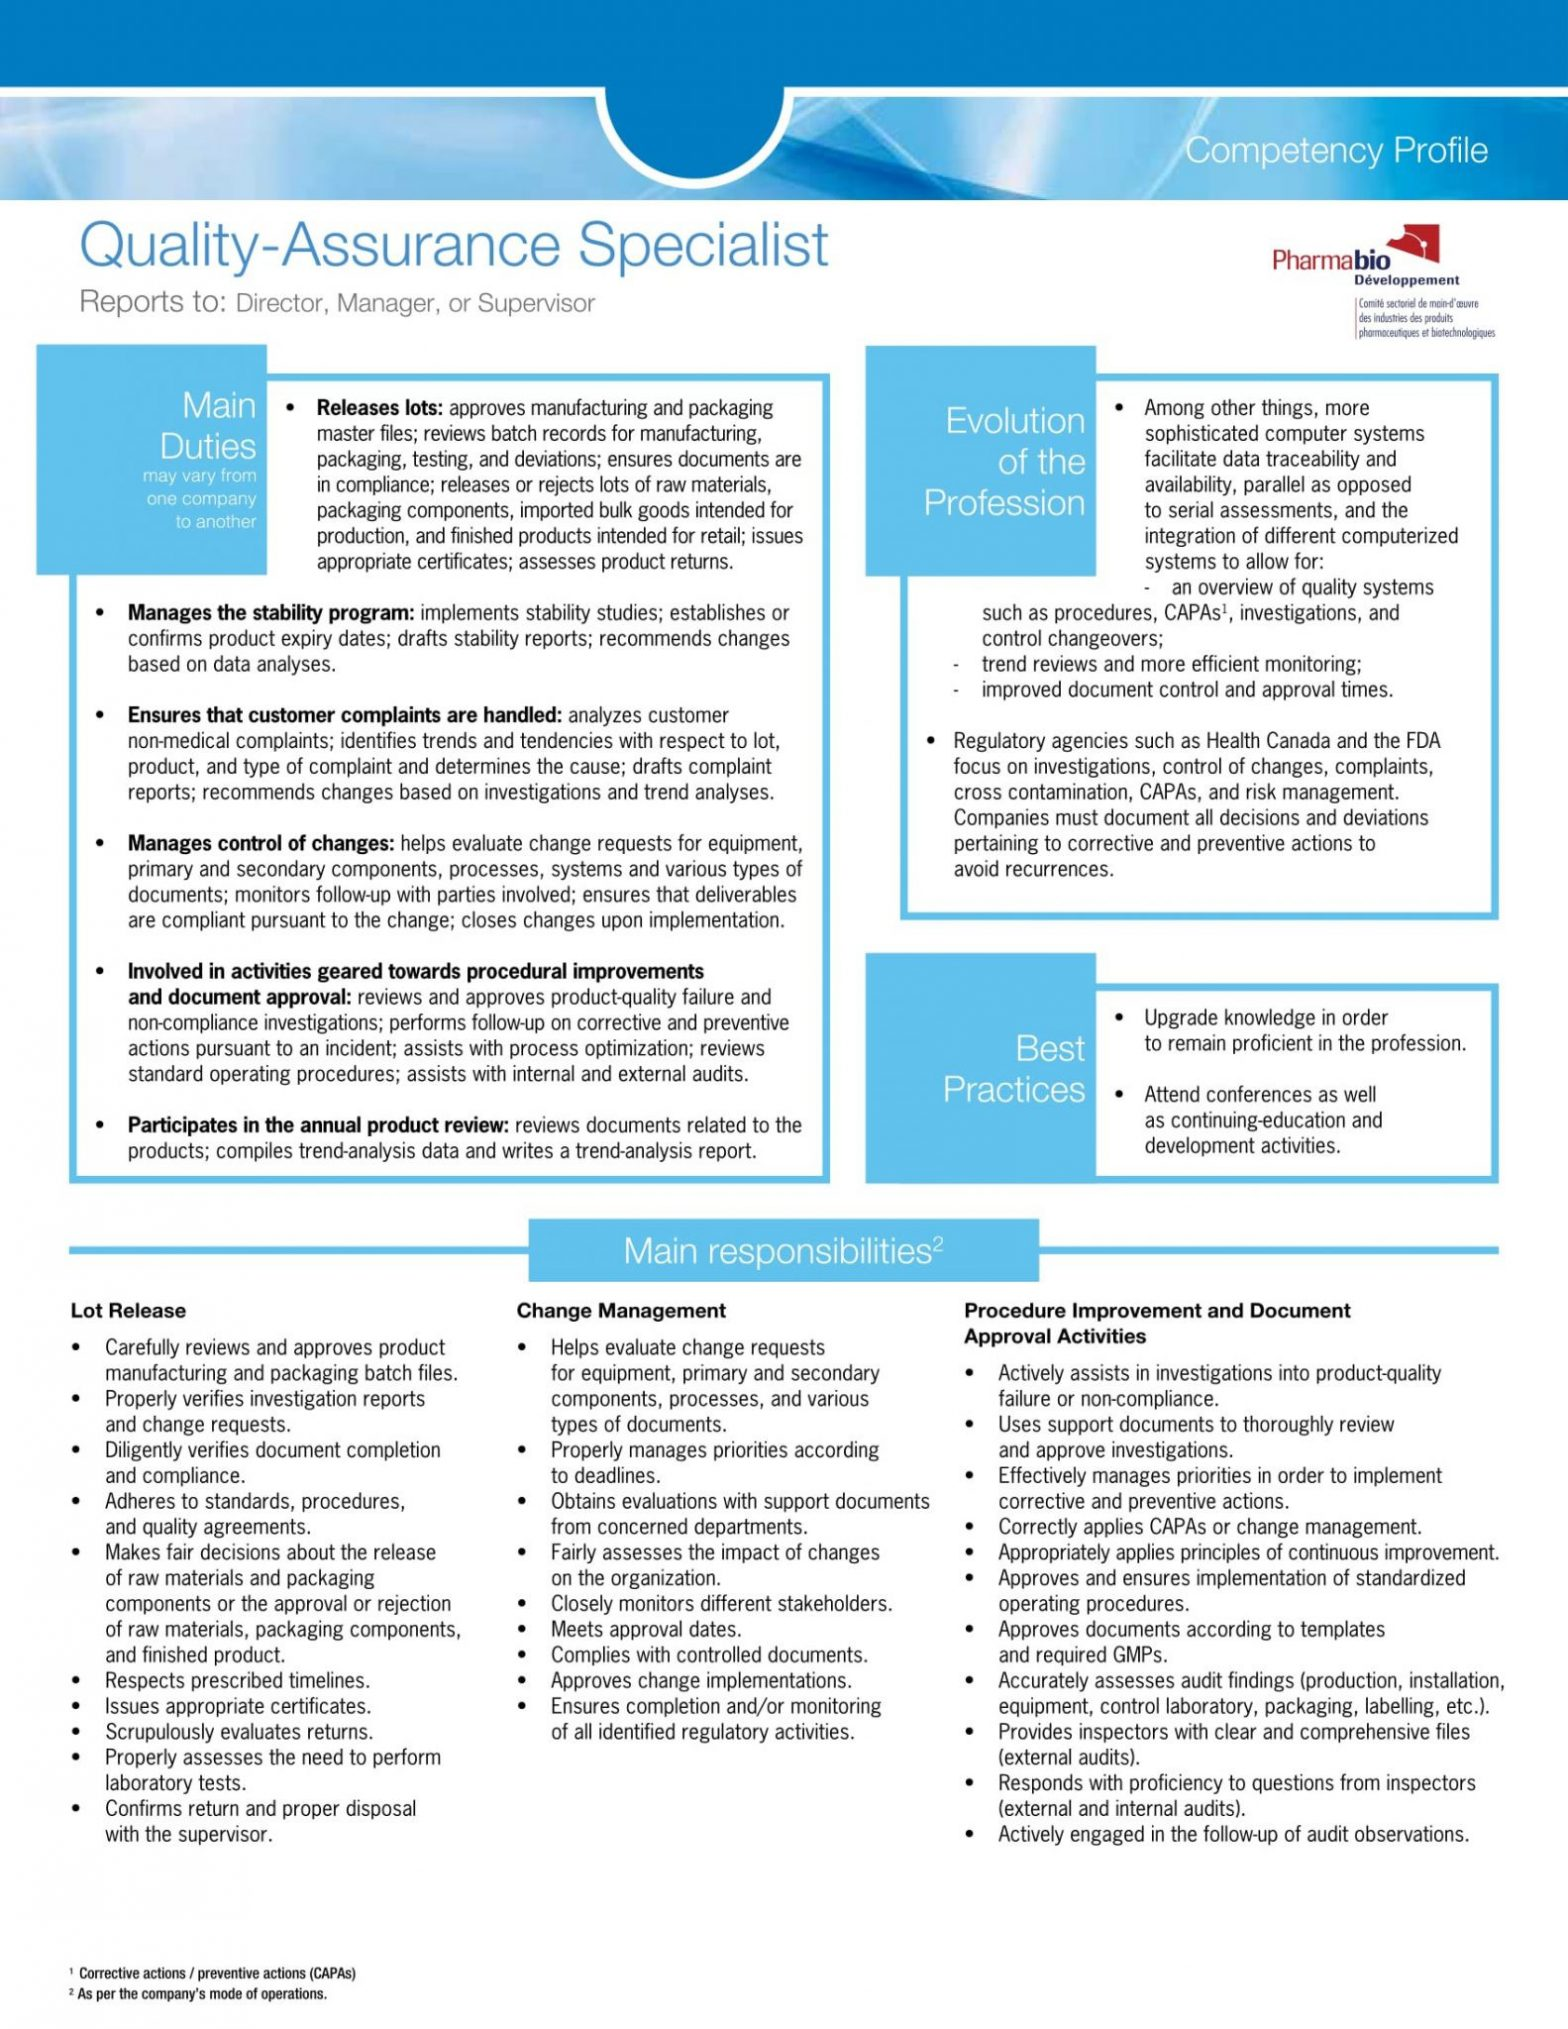 Sample Resume for Pharmaceutical Quality assurance 14 Awesome Quality assurance Resume Sample Templates - Wisestep